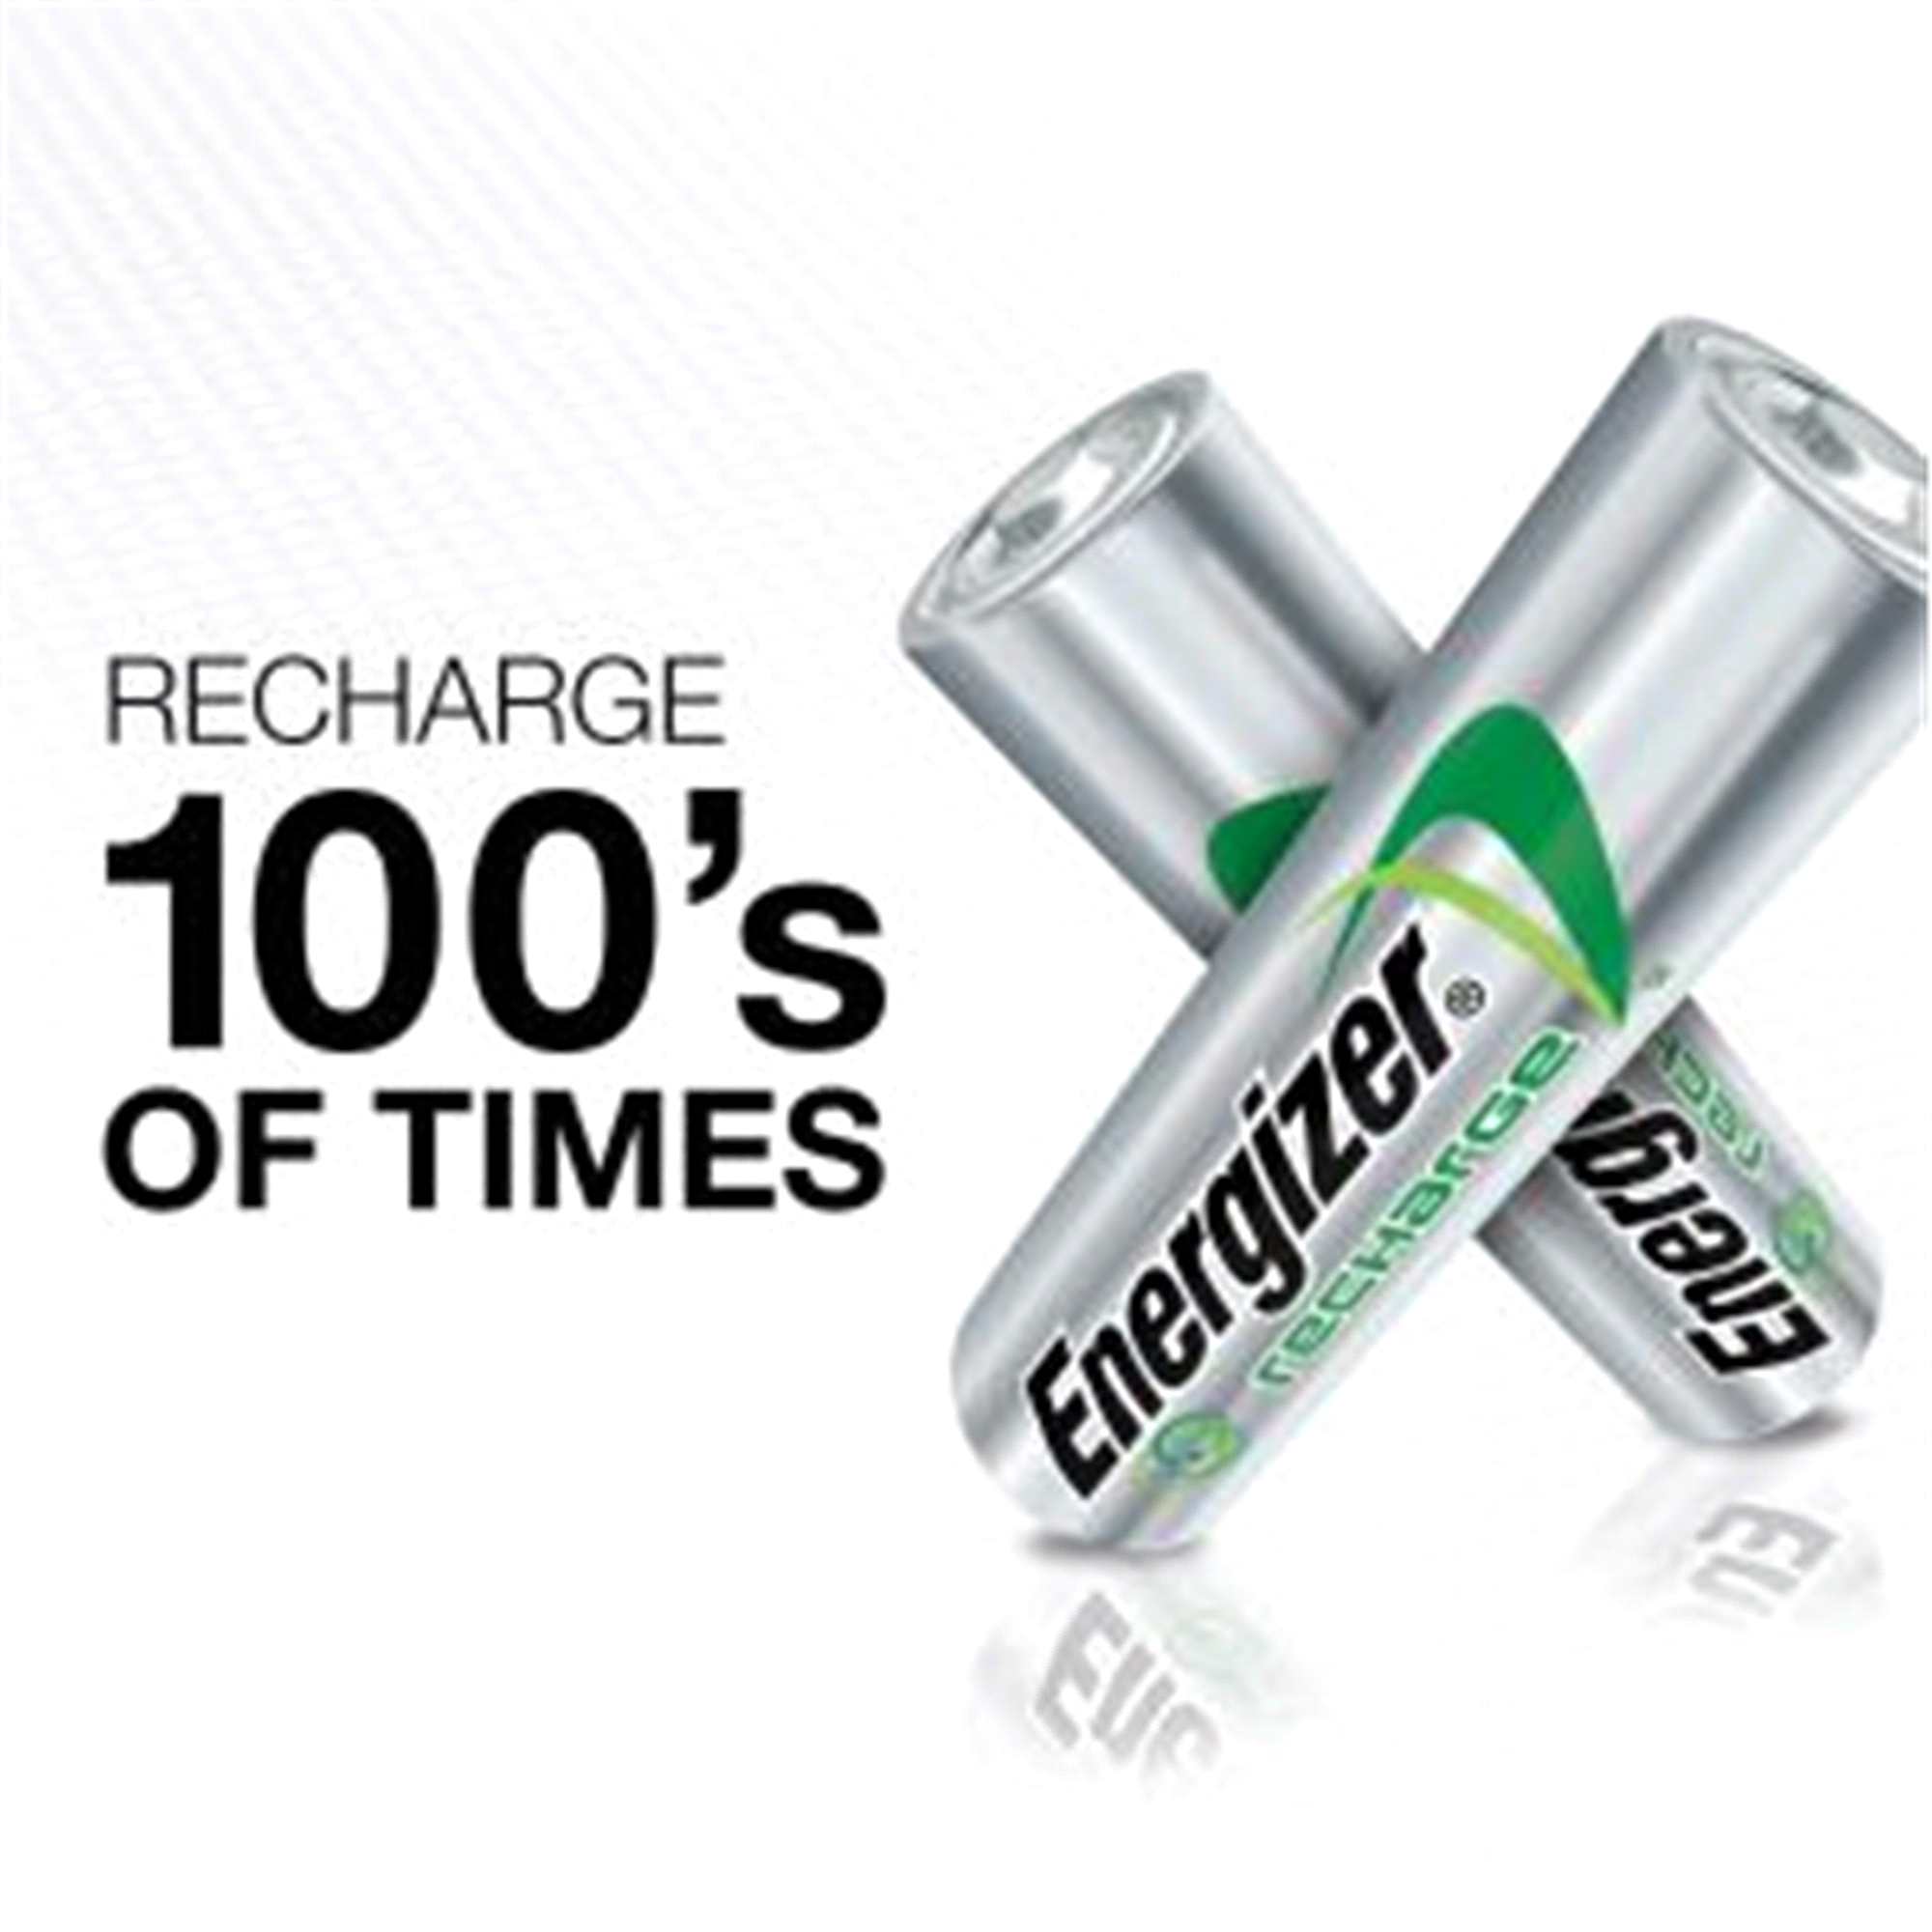 Energizer Rechargeable Aa Battery 4 Pack Batre Cas Recharge Maxi A2